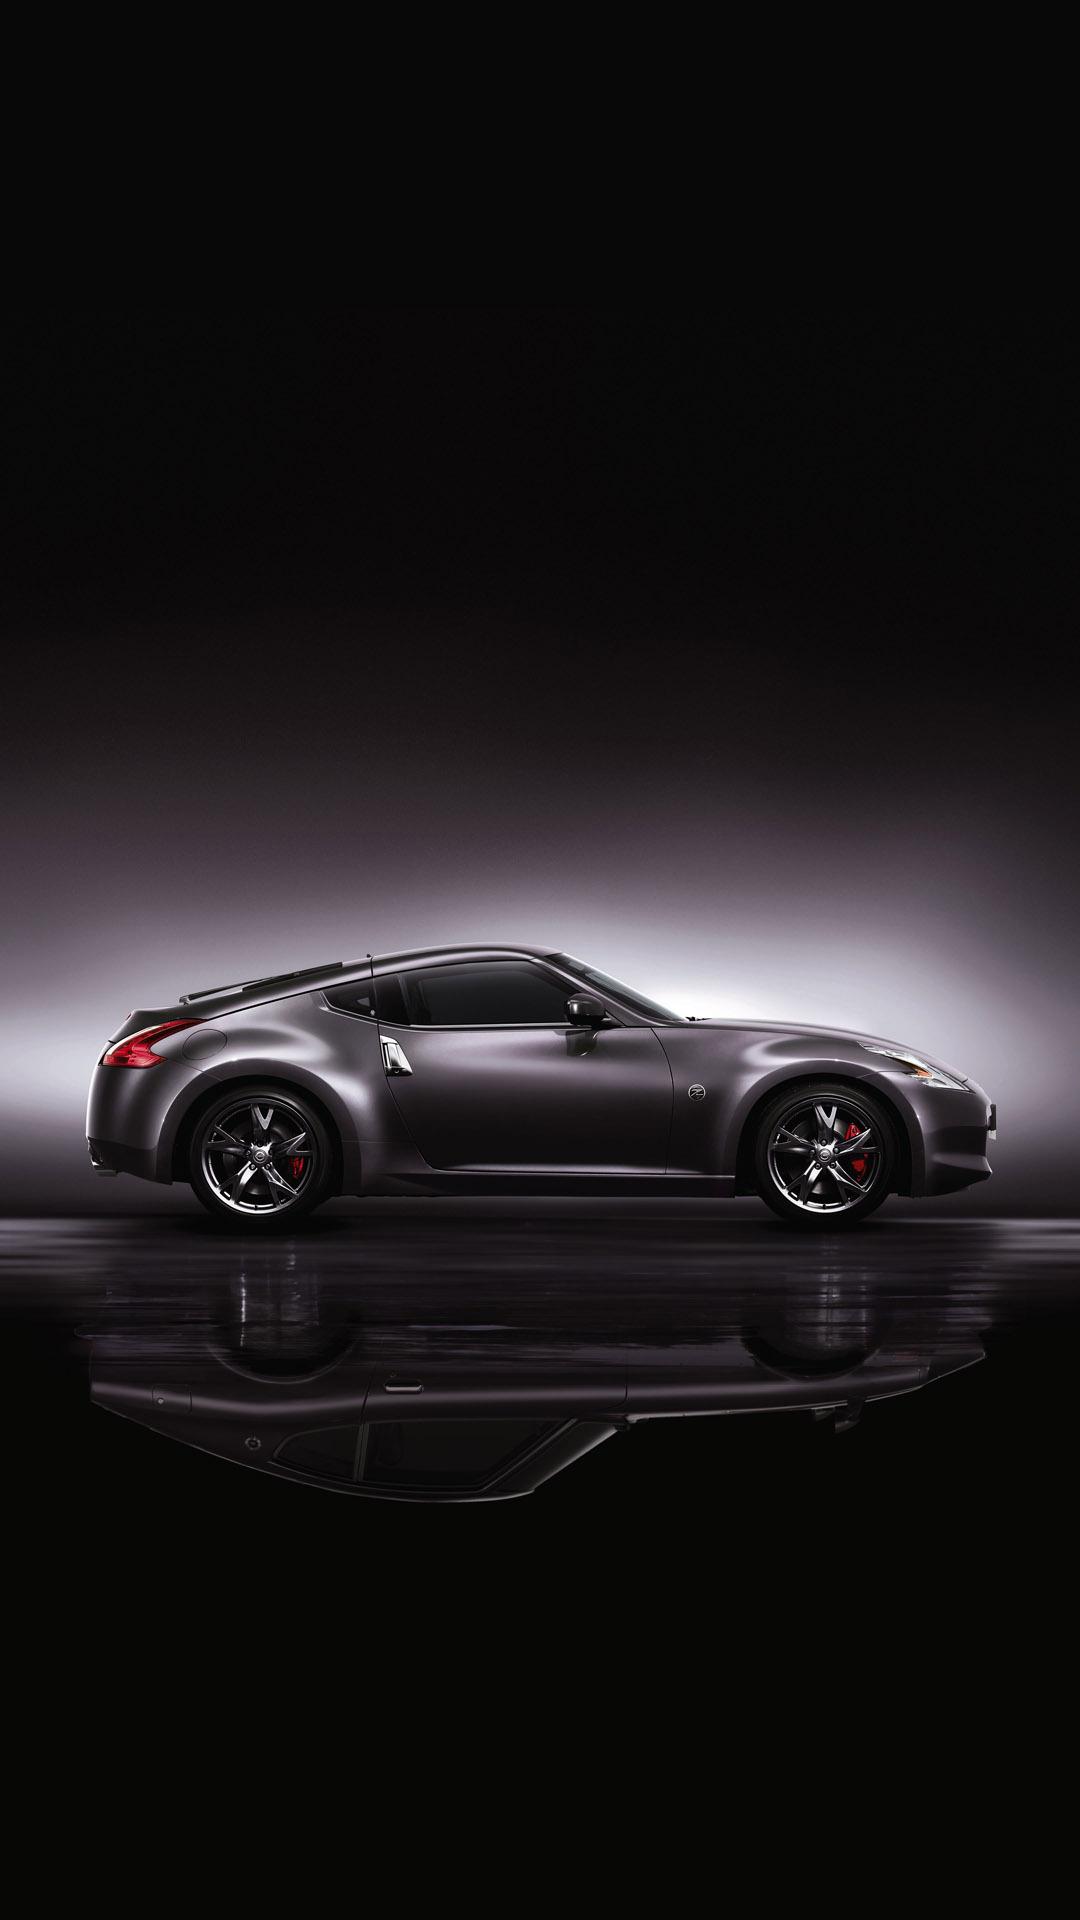 Nissan 370z Best Htc One Wallpapers